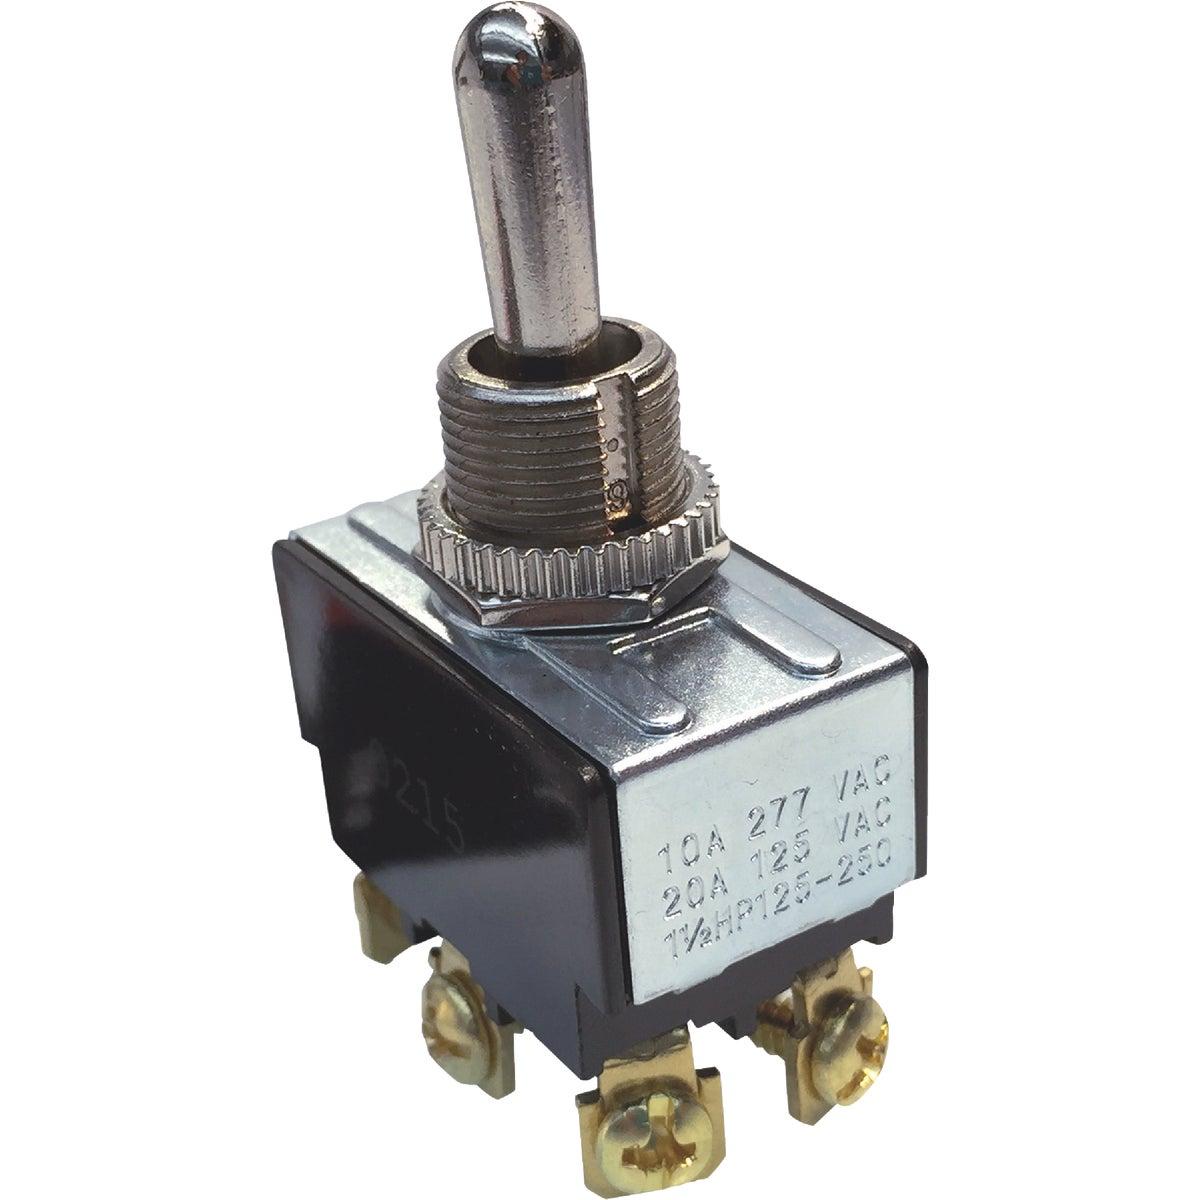 HEAVY DUTY TOGGLE SWITCH - GSW-16 by G B Electrical Inc